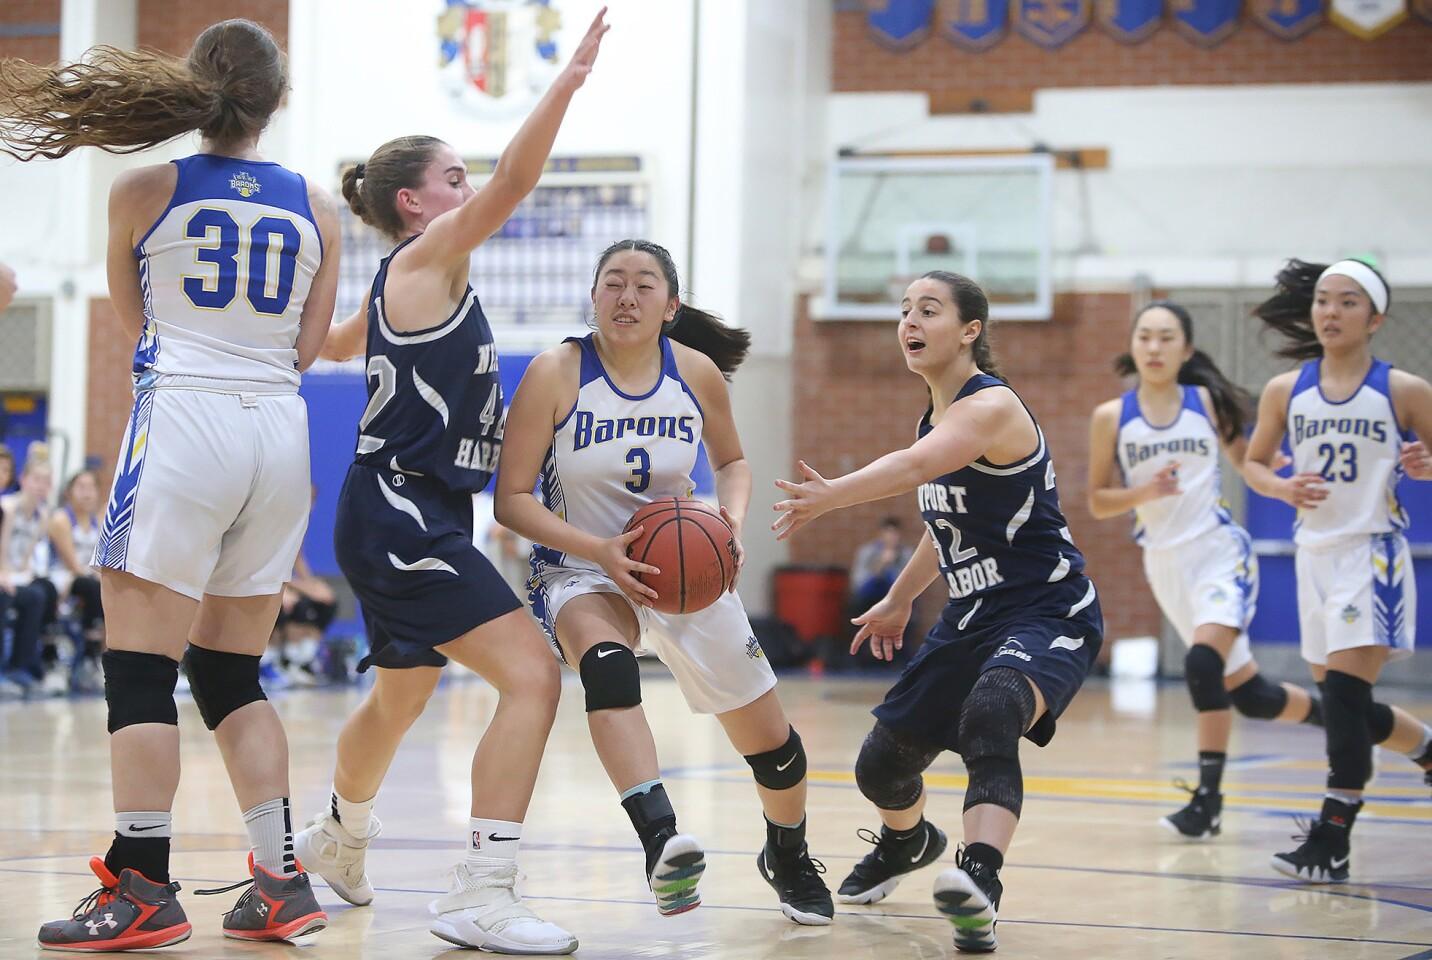 Photo Gallery: Newport Harbor vs. Fountain Valley in girls' basketball